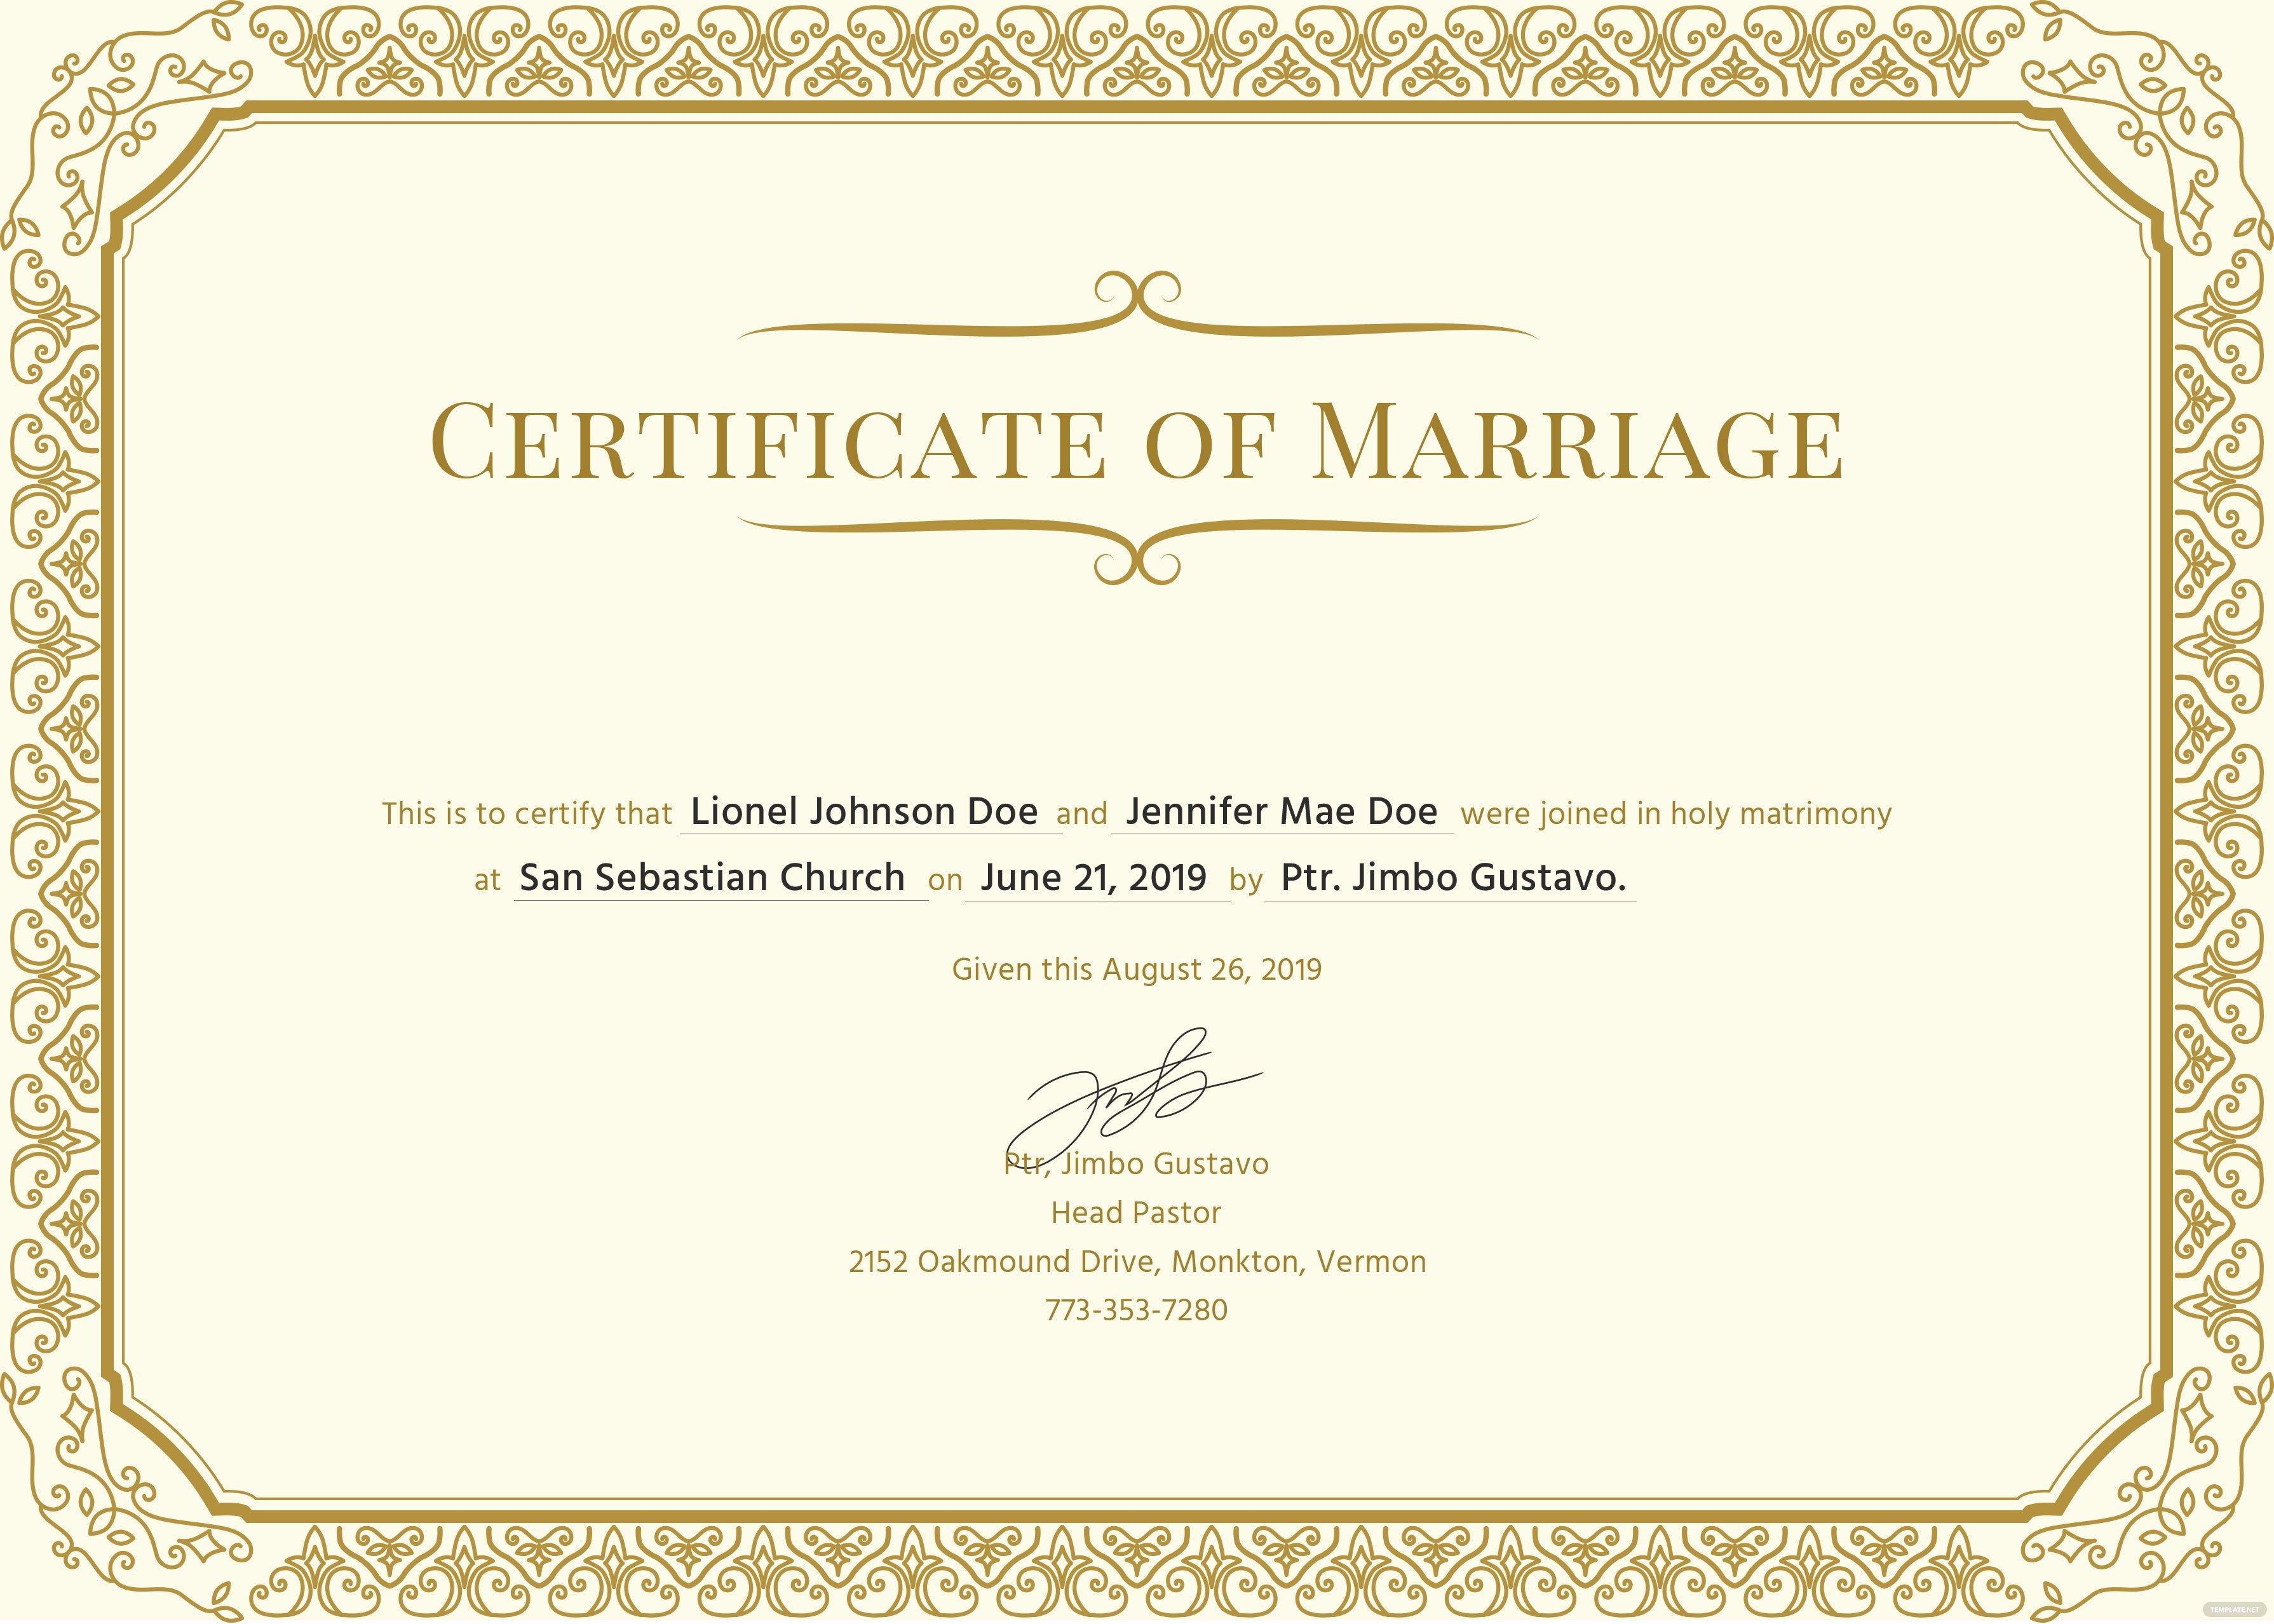 Keepsake Marriage Certificate Template Unique Free Marriage Certificate Template In Psd Ms Word